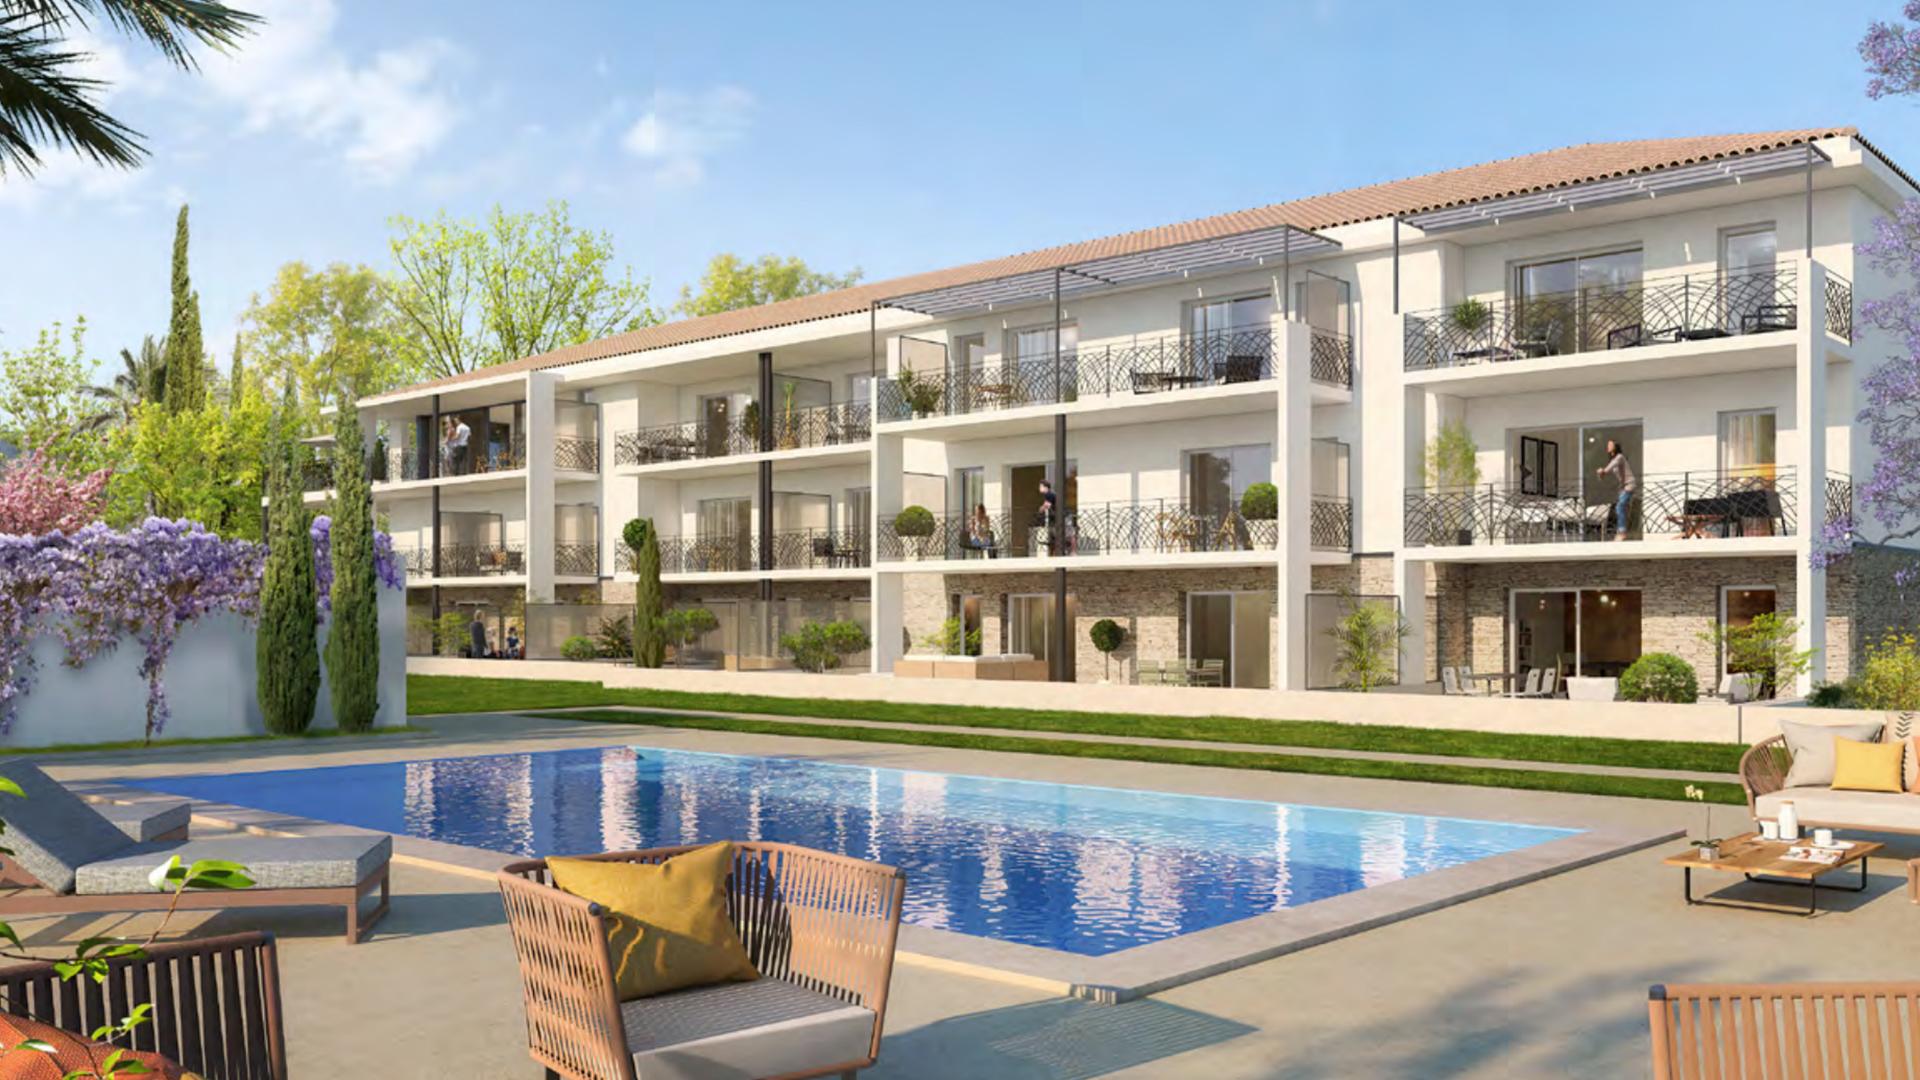 Apartments for sale in La Garde 83130